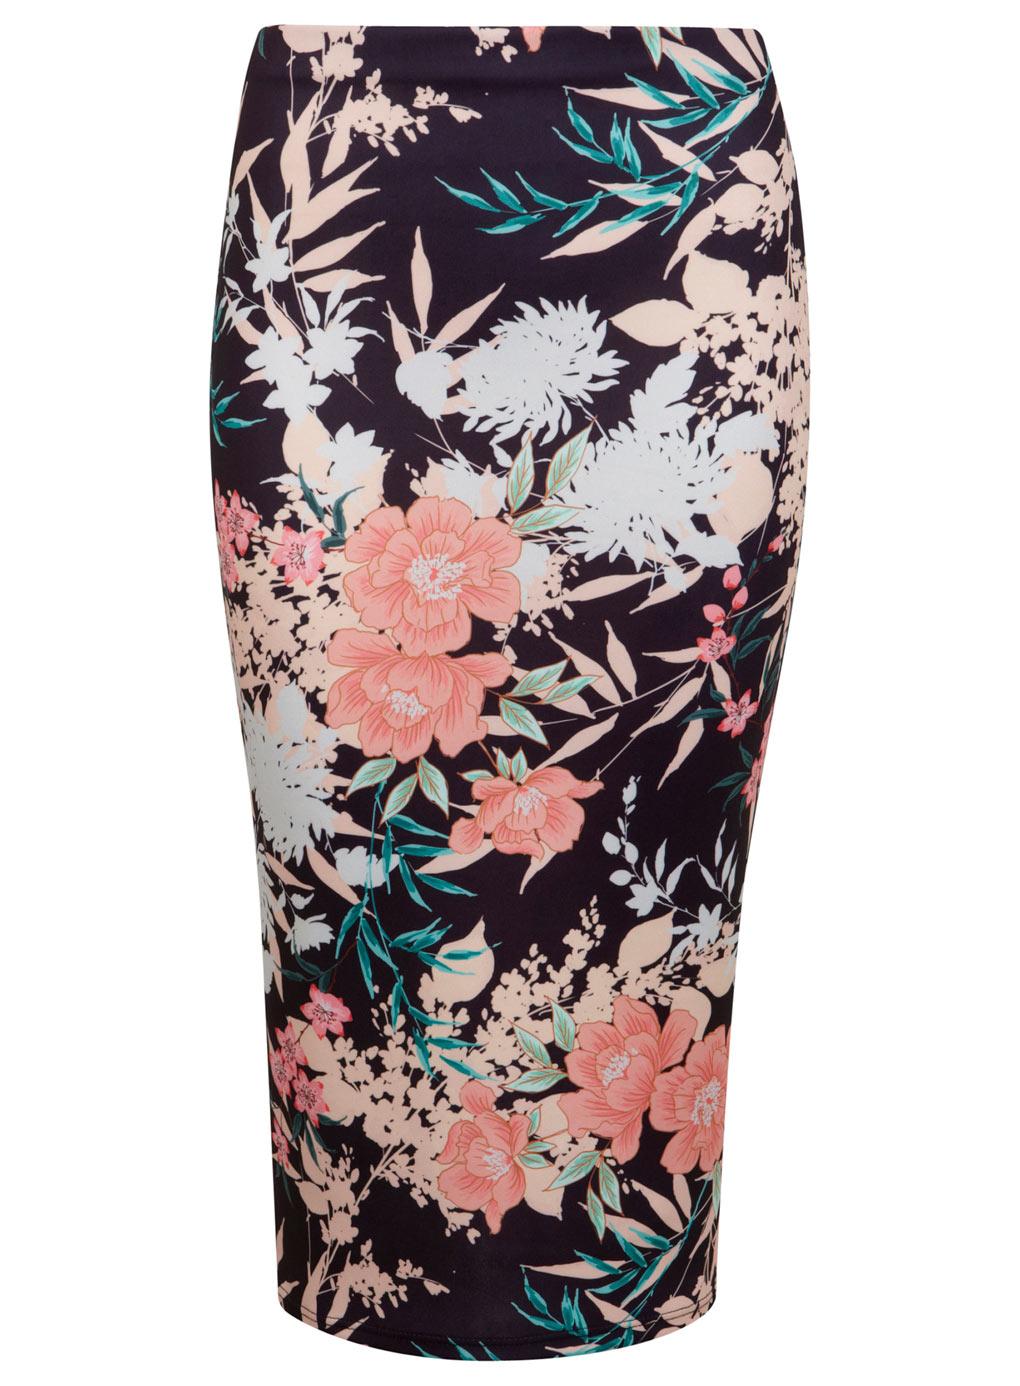 M1ss S3lfridge NAVY Oriental Floral Midi Skirt - Size 6 to 16